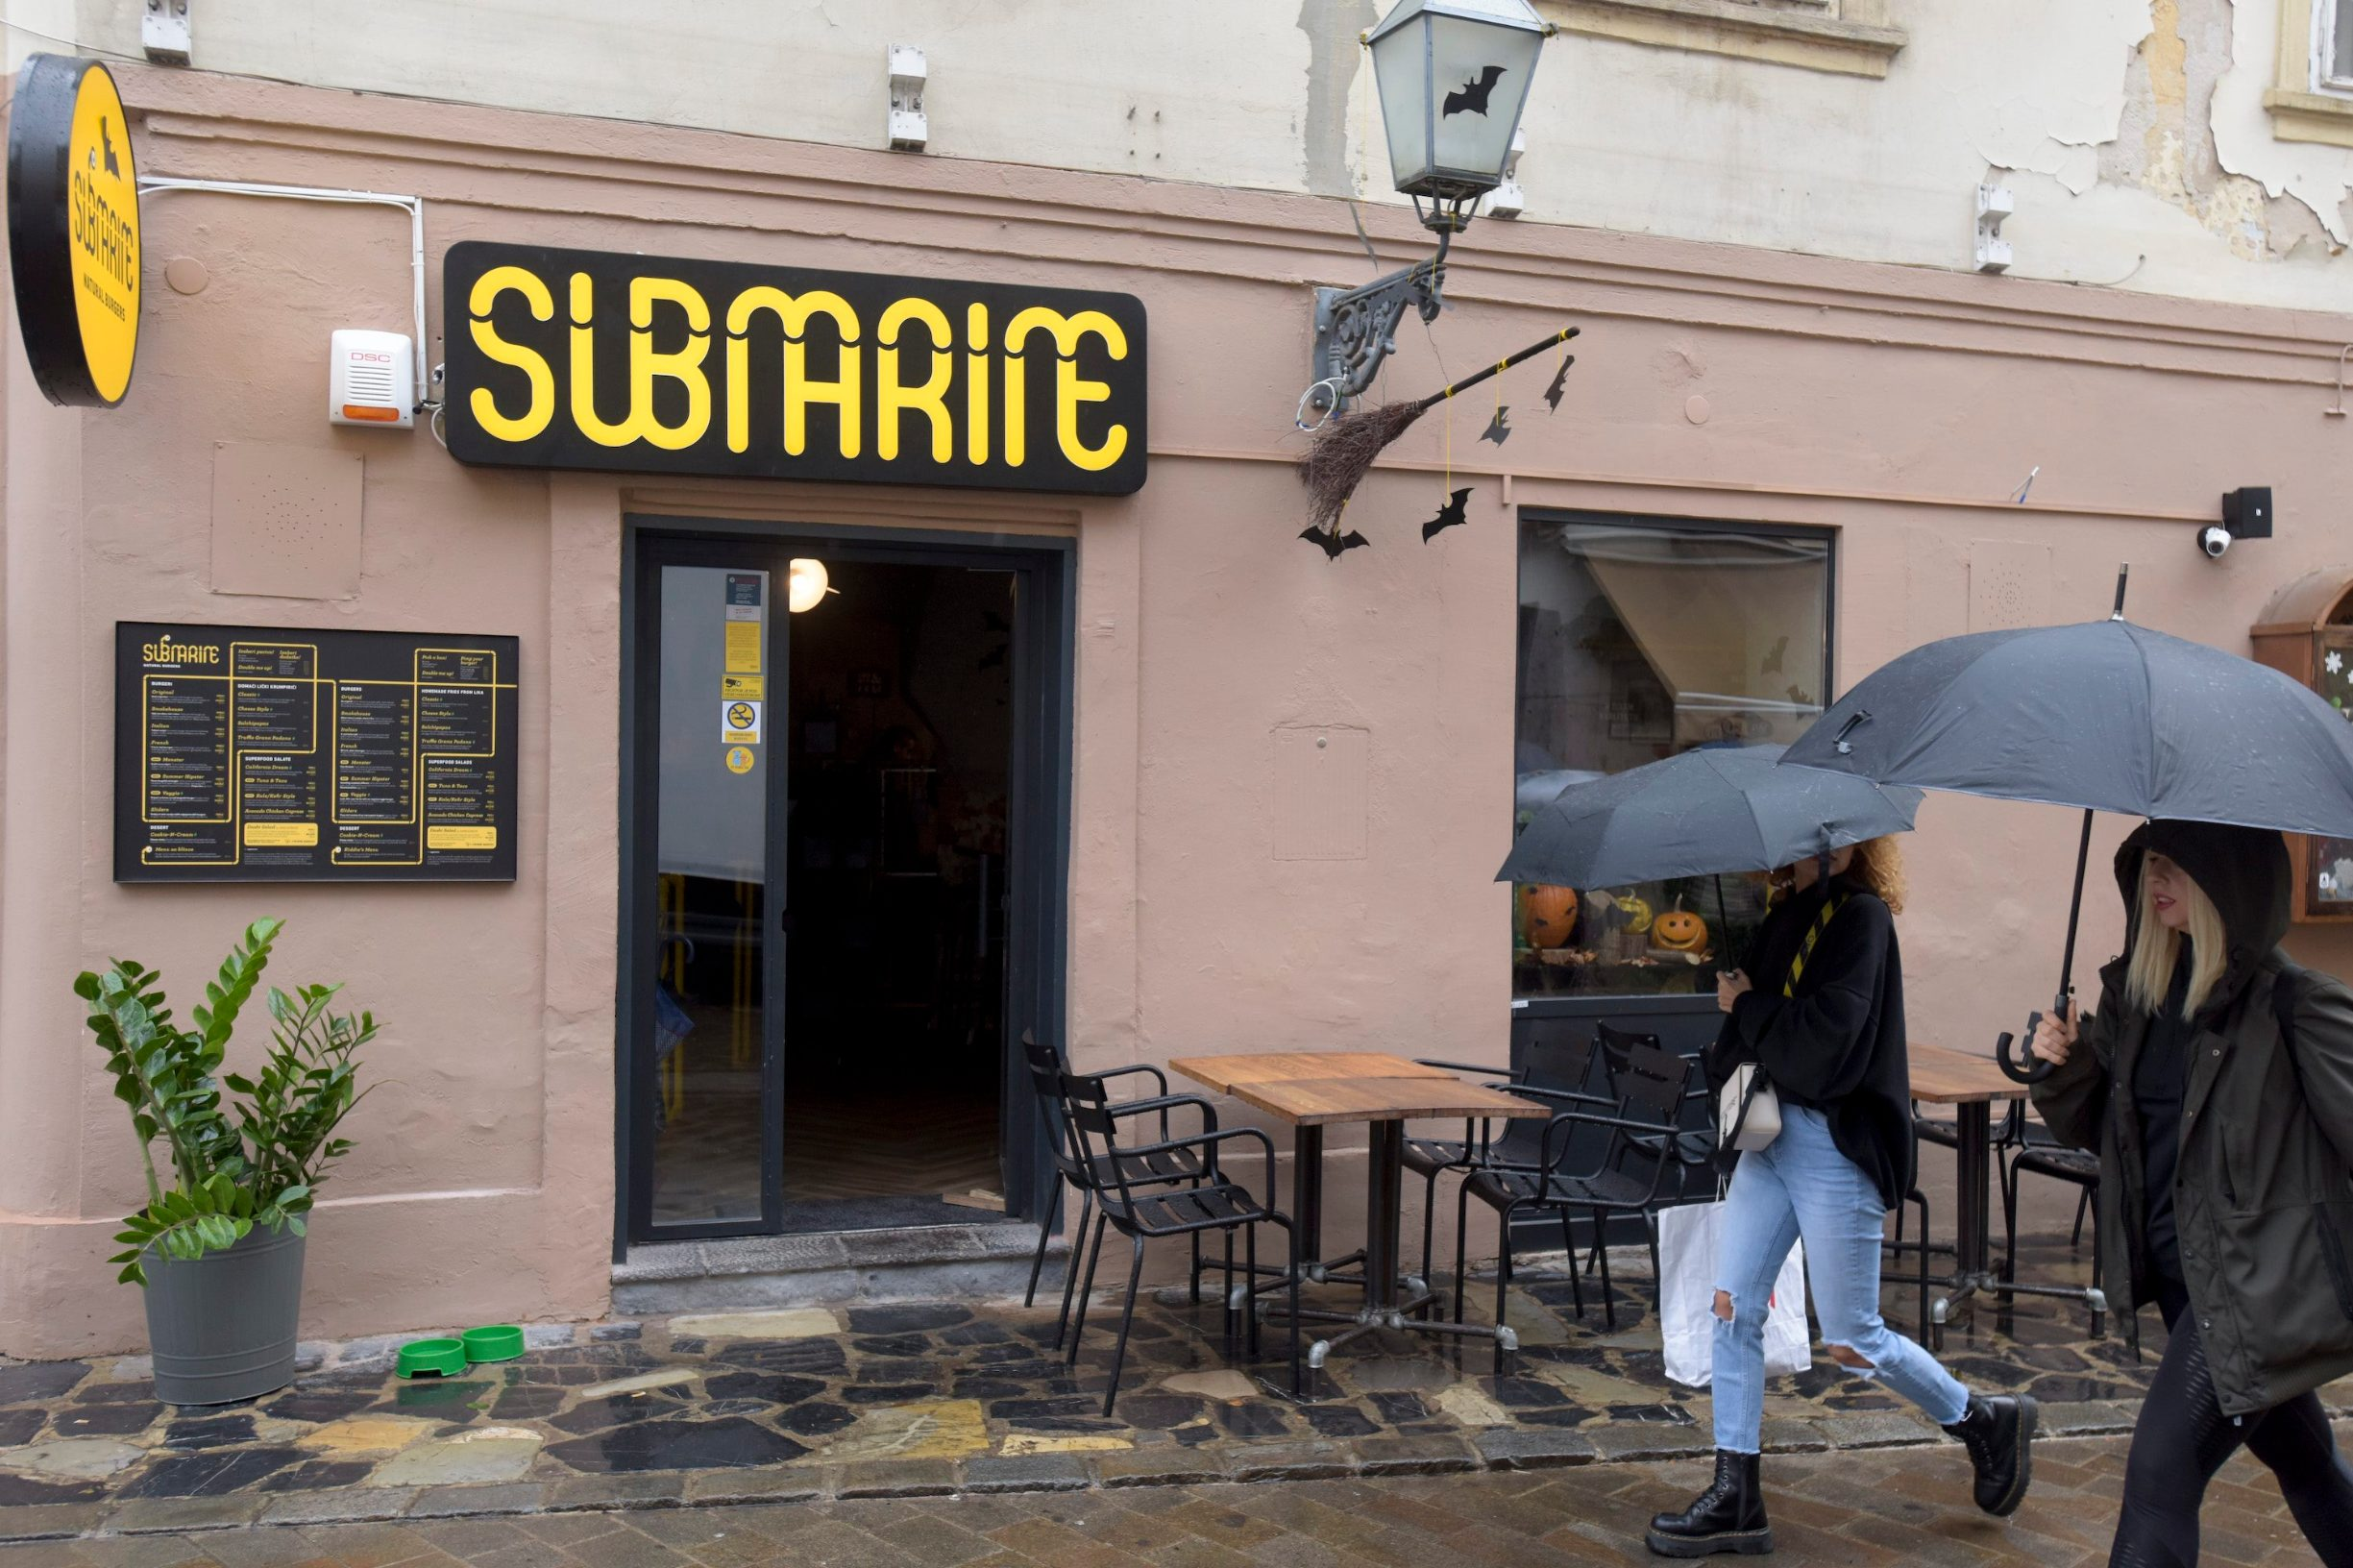 Zagreb, 311019. Tkalciceva 12. Submarine natural burgers, restoran brze hrane. Foto: Darko Tomas / CROPIX